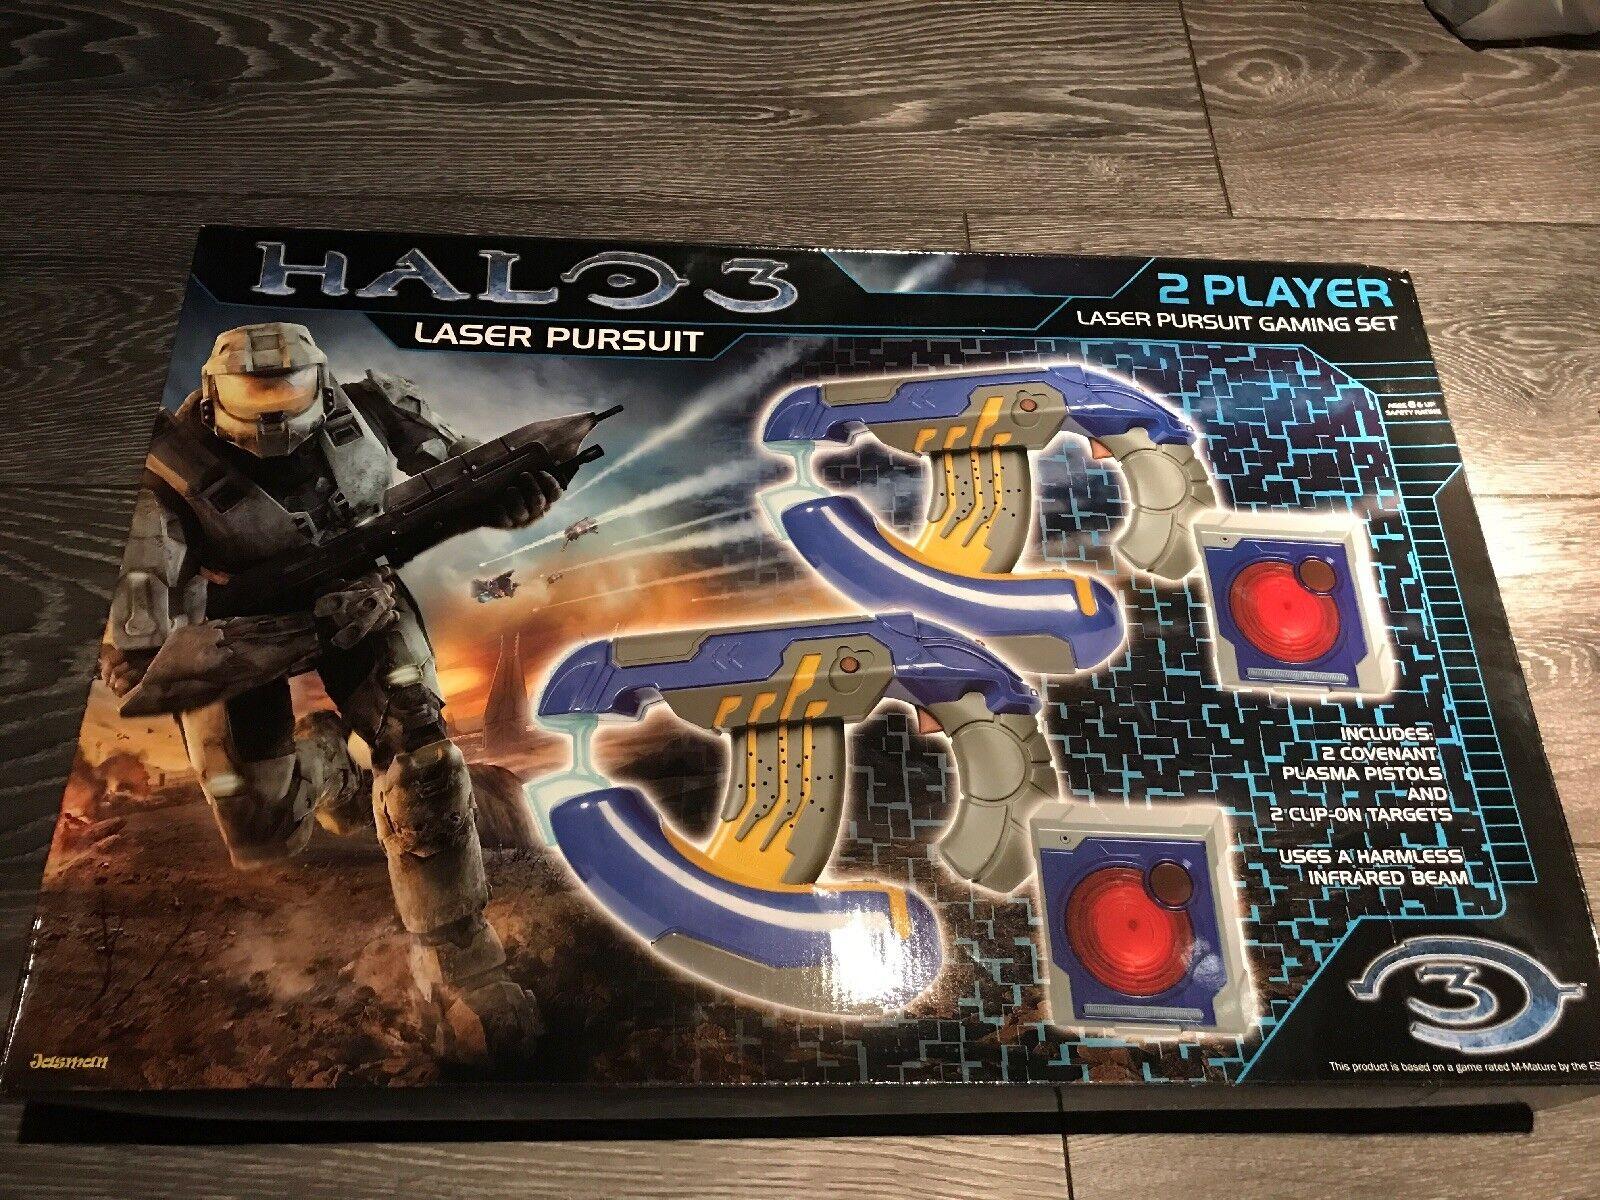 Rare Halo Halo Halo 3 laser pursuit Gaming Set 1adb26